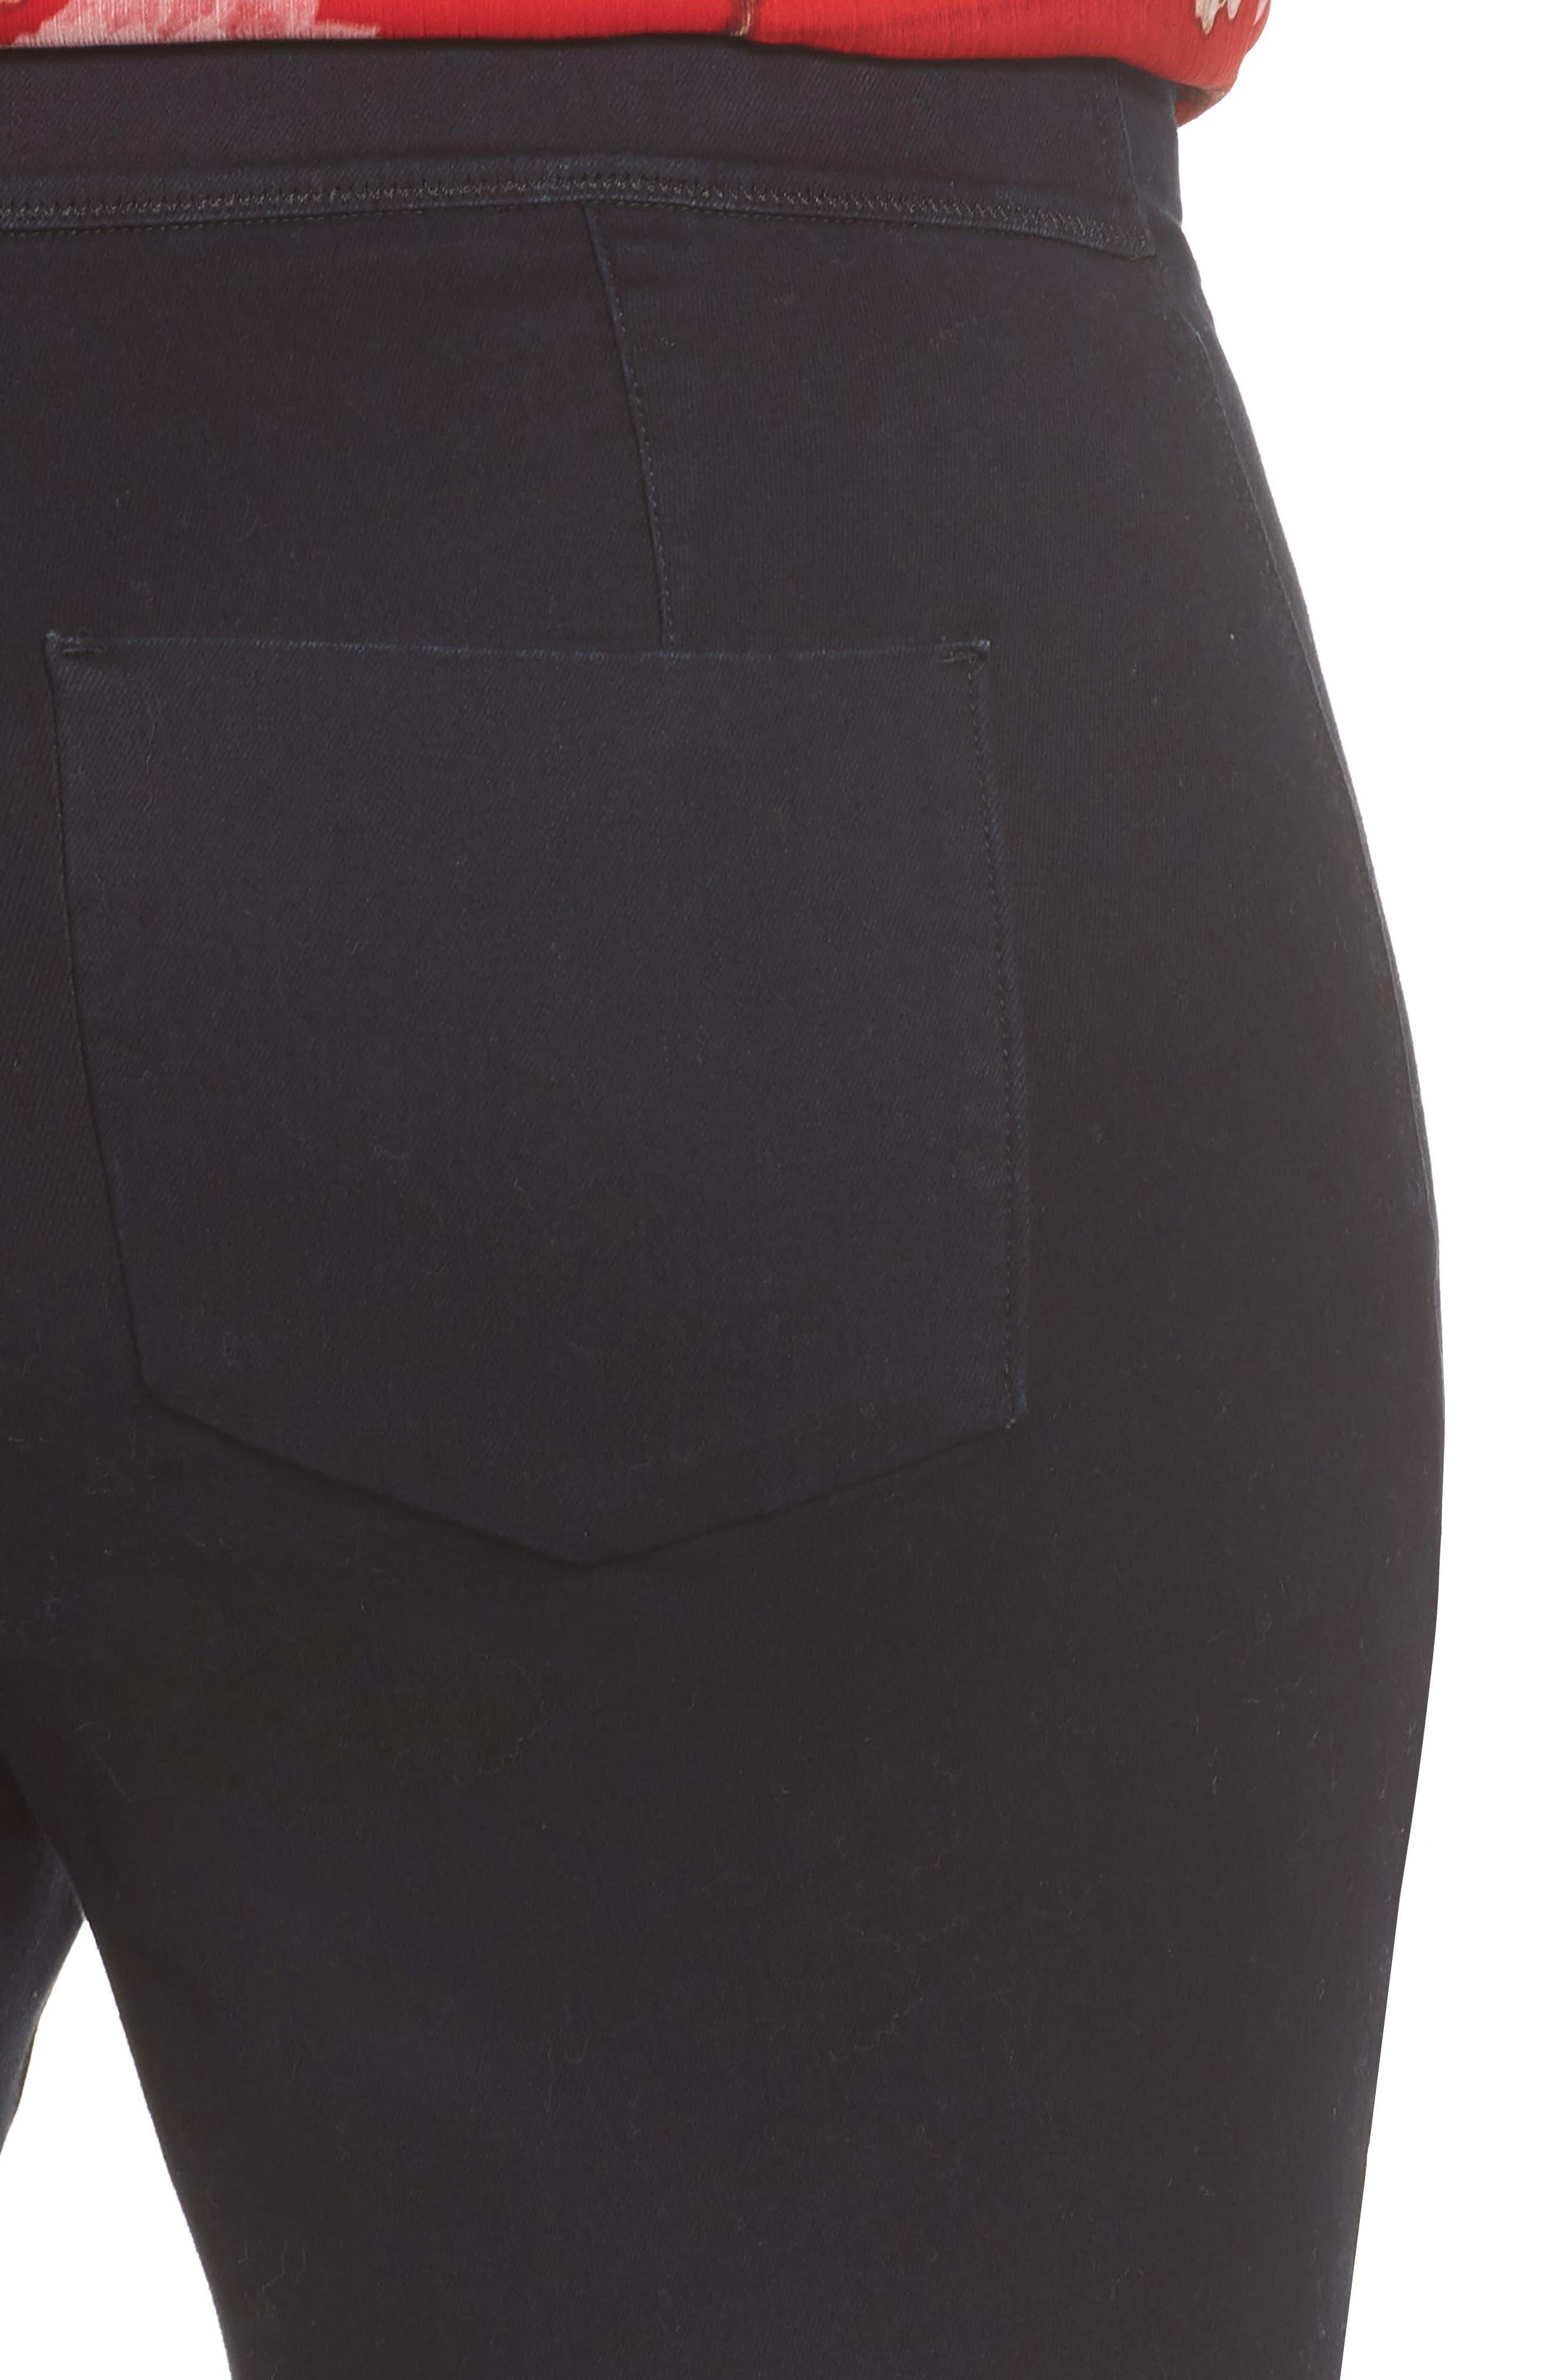 Super Stretch Denim Leggings,                             Alternate thumbnail 4, color,                             RICH BLACK